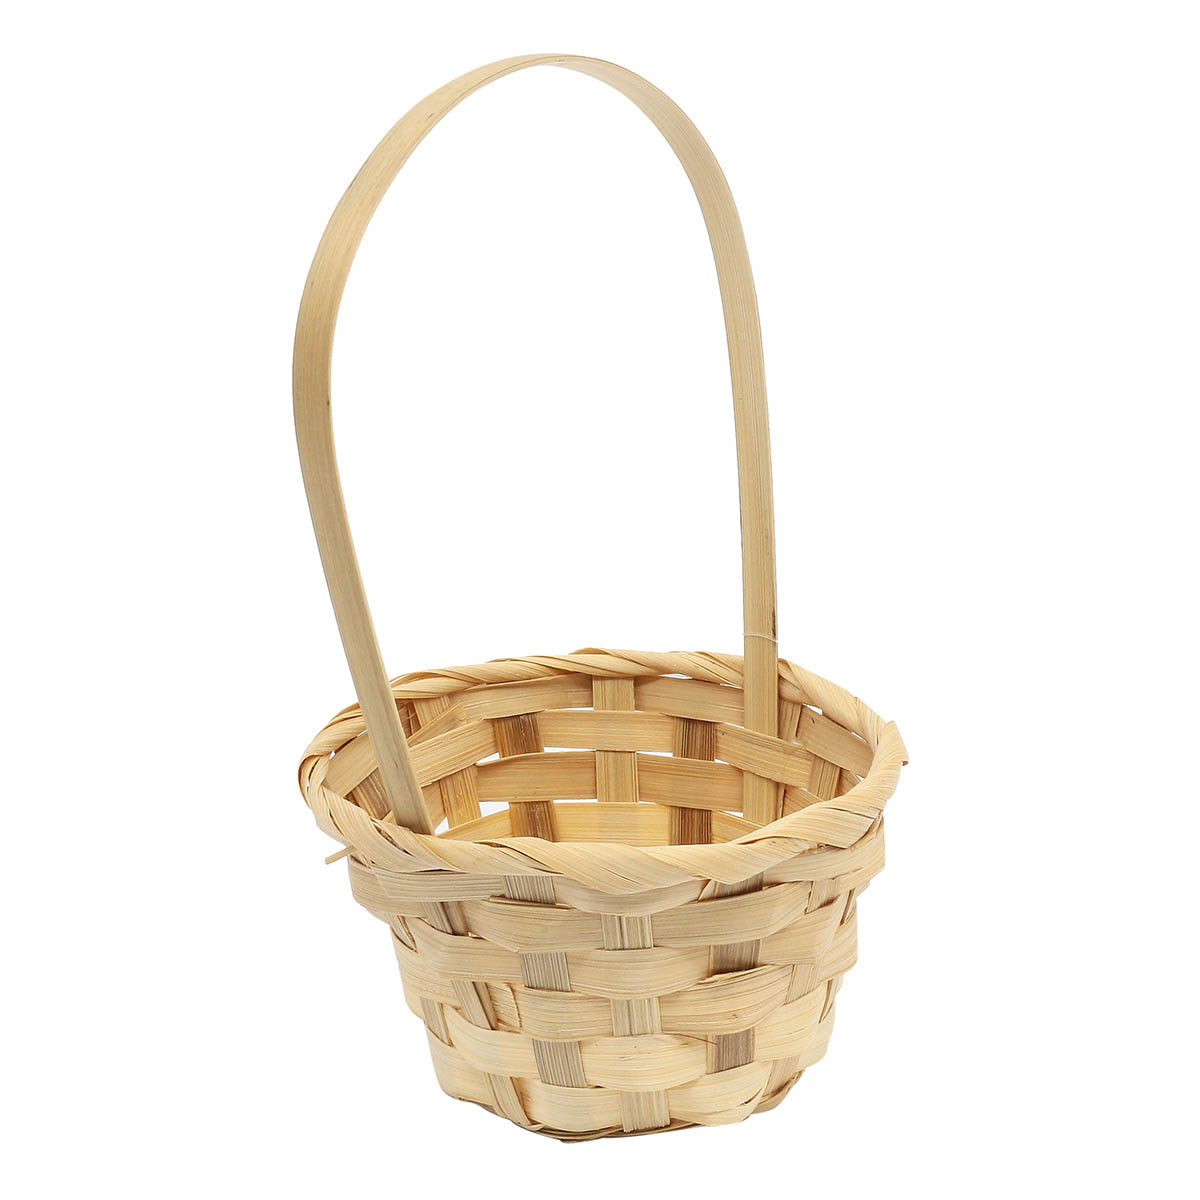 19HJ19091 Корзина плетеная бамбук 11,5*6,5*Н20,5см, цв. натуральный Астра